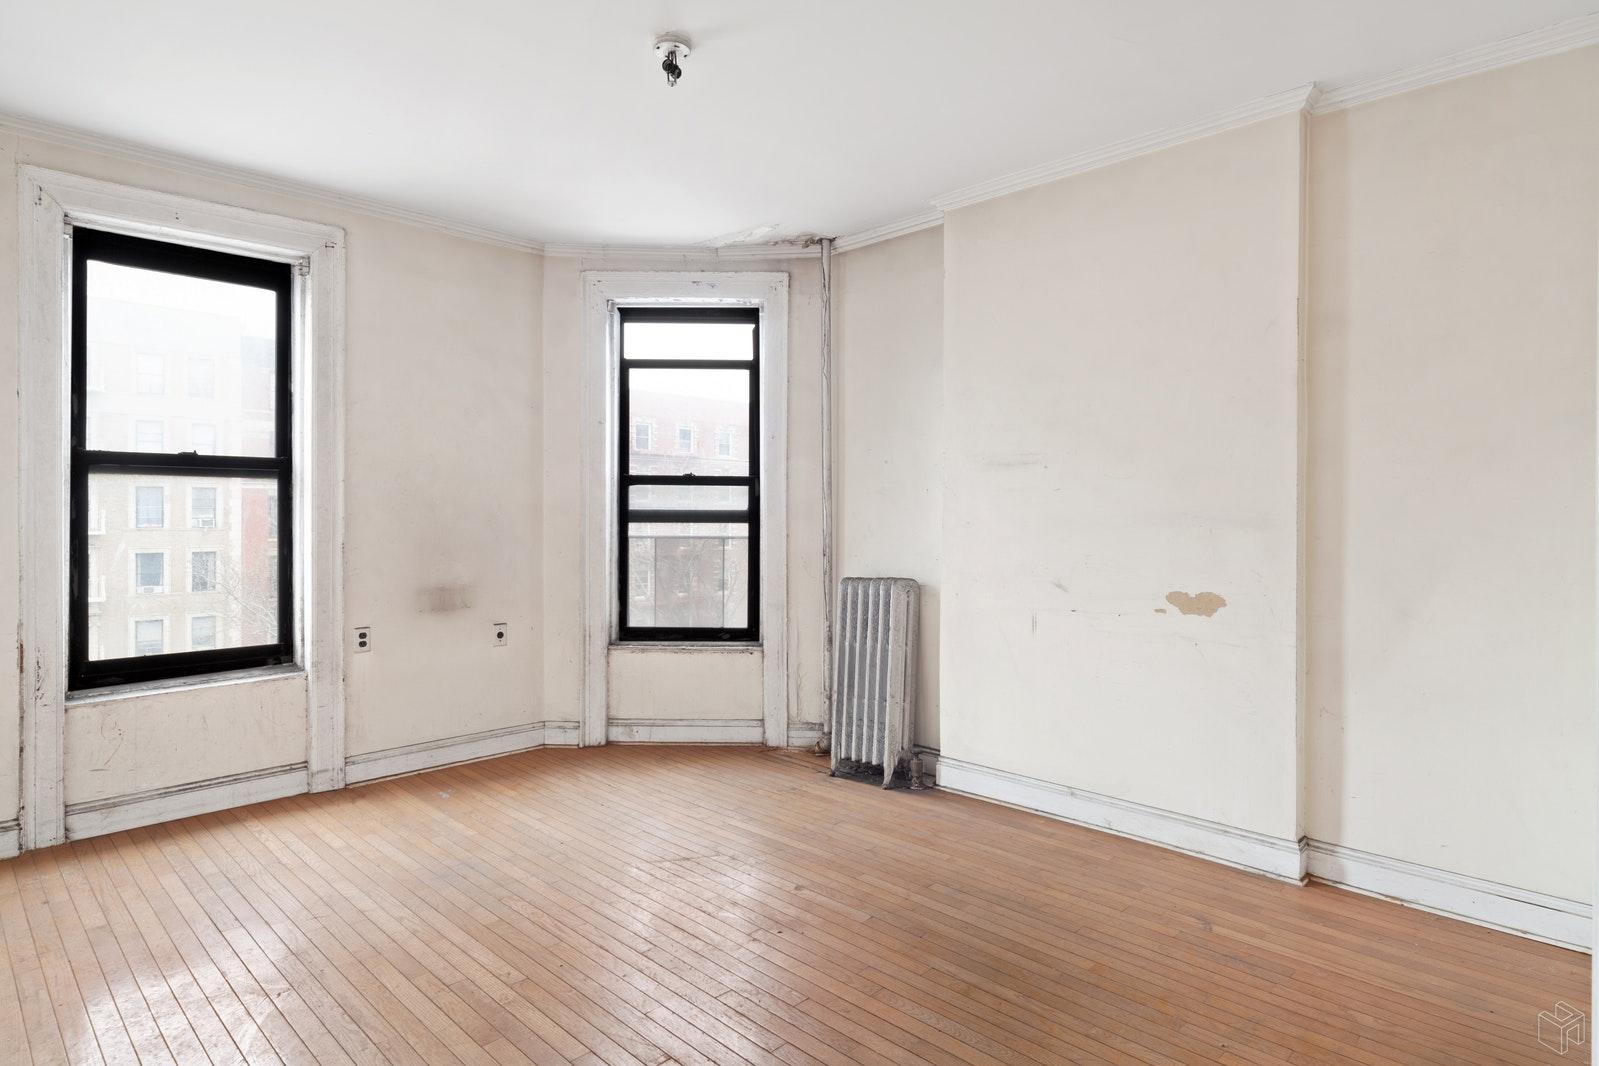 1878 SEVENTH AVENUE, Harlem, $419,000, Web #: 19514268